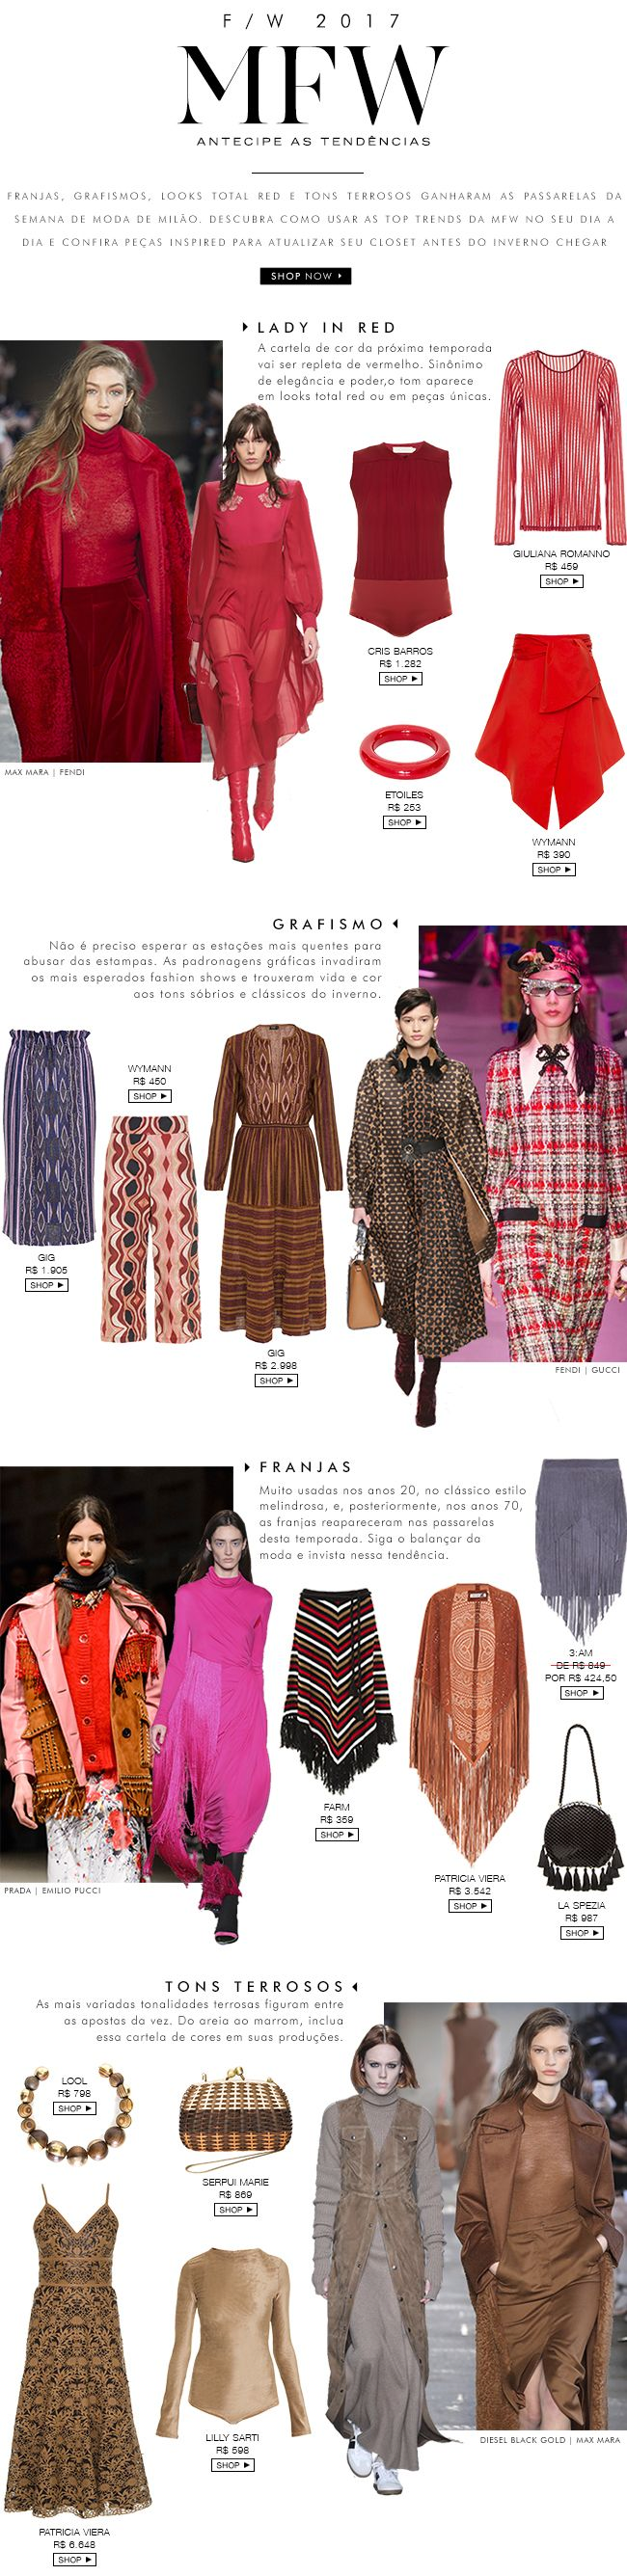 newsletter, gallerist, fashion, layout, semanas de moda internacionais,fashion weeks, tendências, trends, mfw,